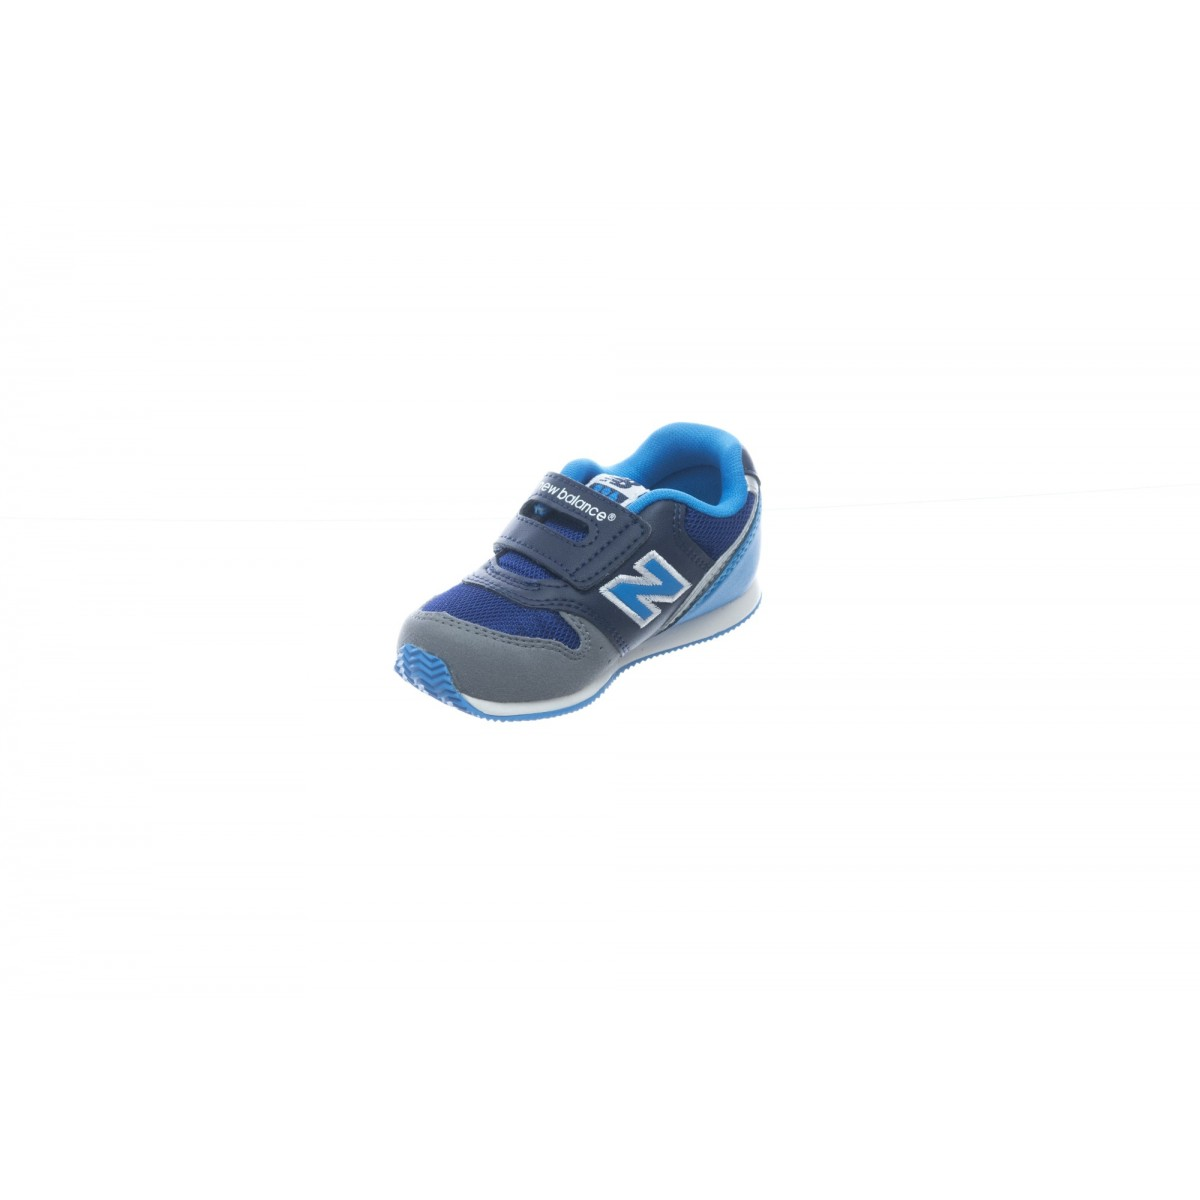 Scarpe - Fs996 infant